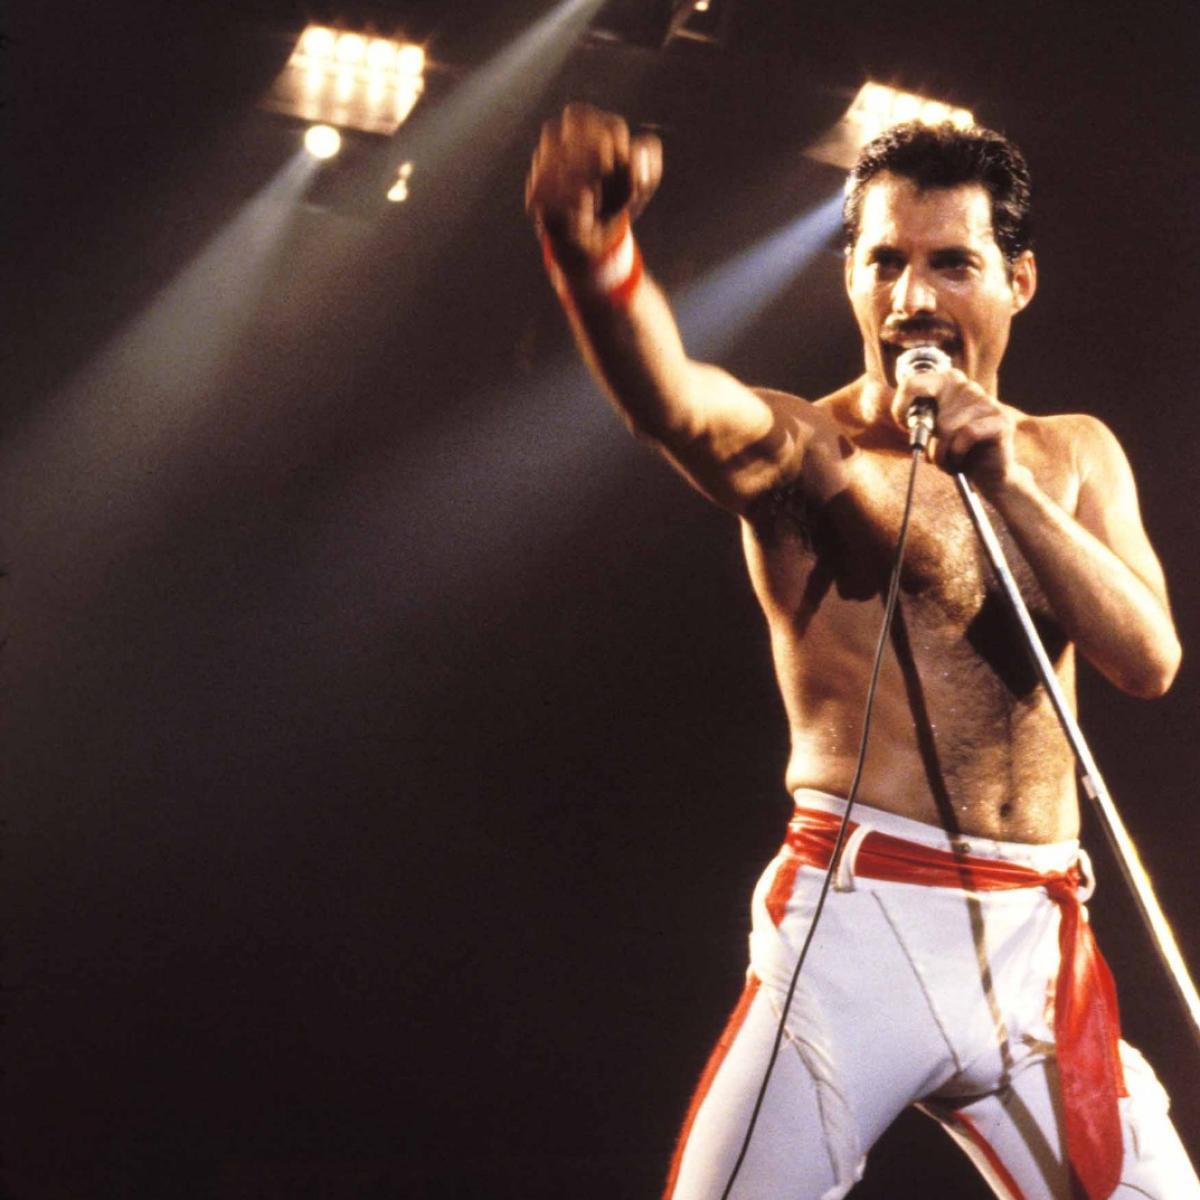 What It Was Really Like Recording 'Bohemian Rhapsody'